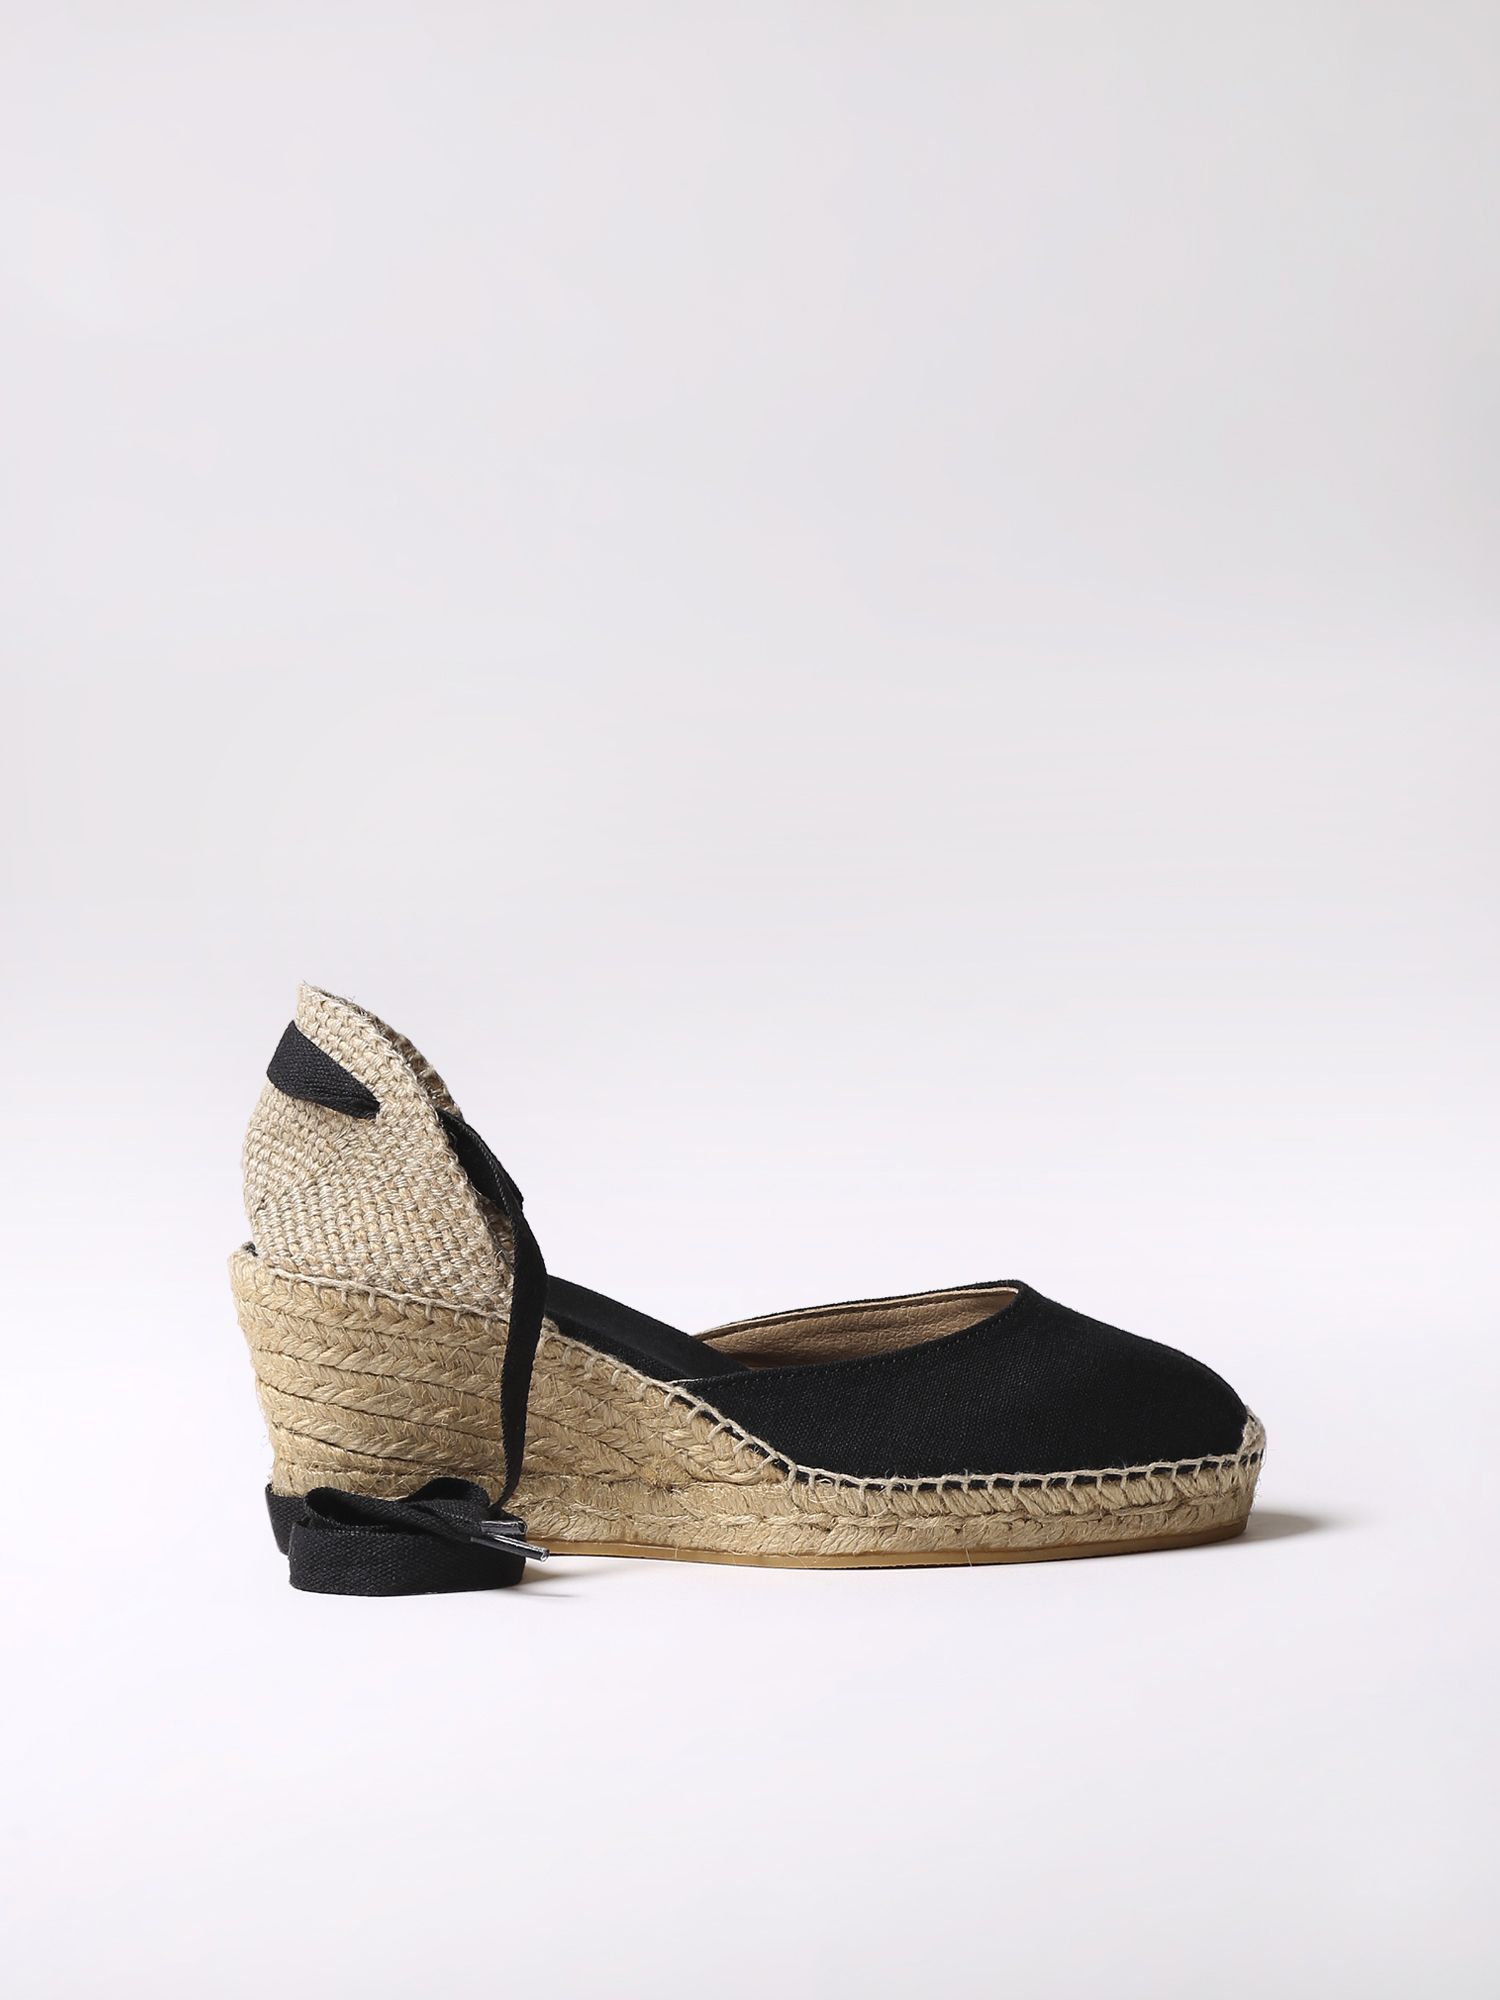 Valenciana espadrilles heel - CALONGE